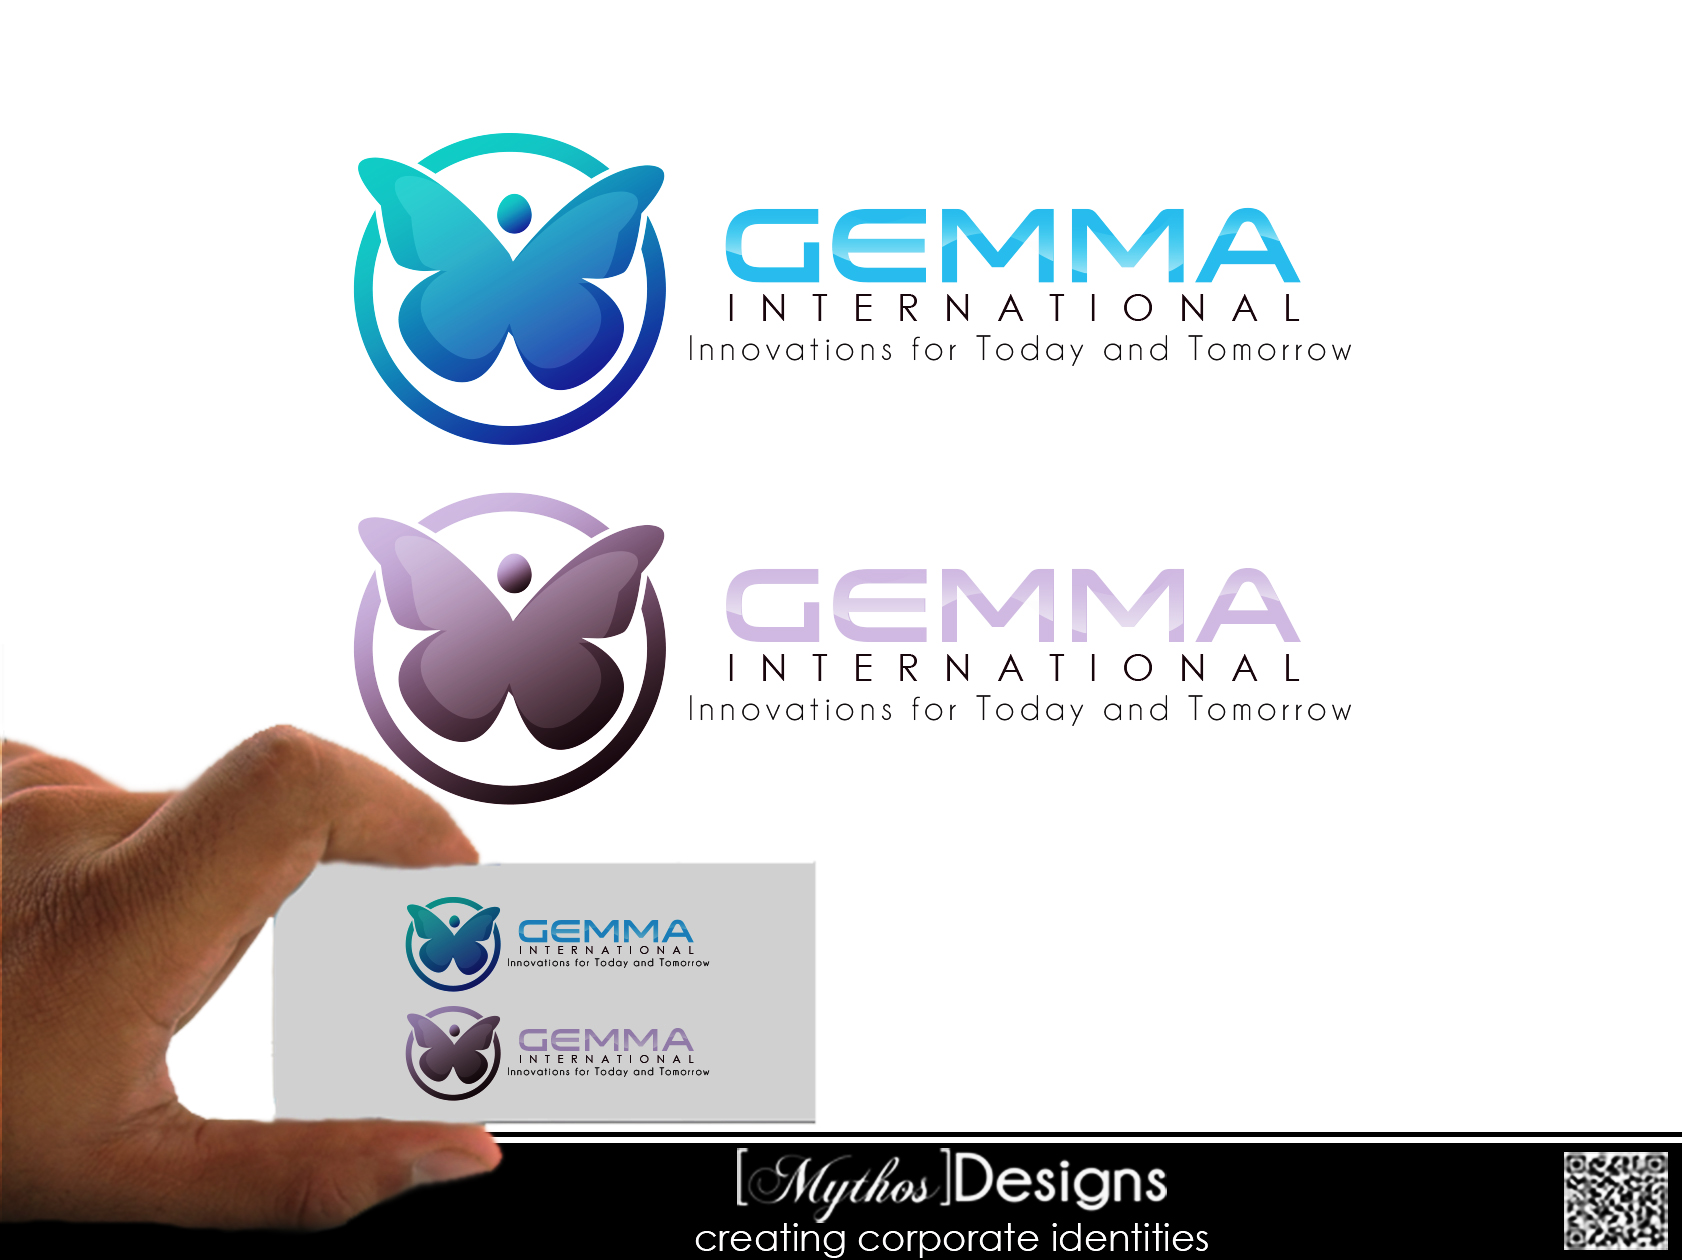 Logo Design by Mythos Designs - Entry No. 67 in the Logo Design Contest Artistic Logo Design for Gemma International.